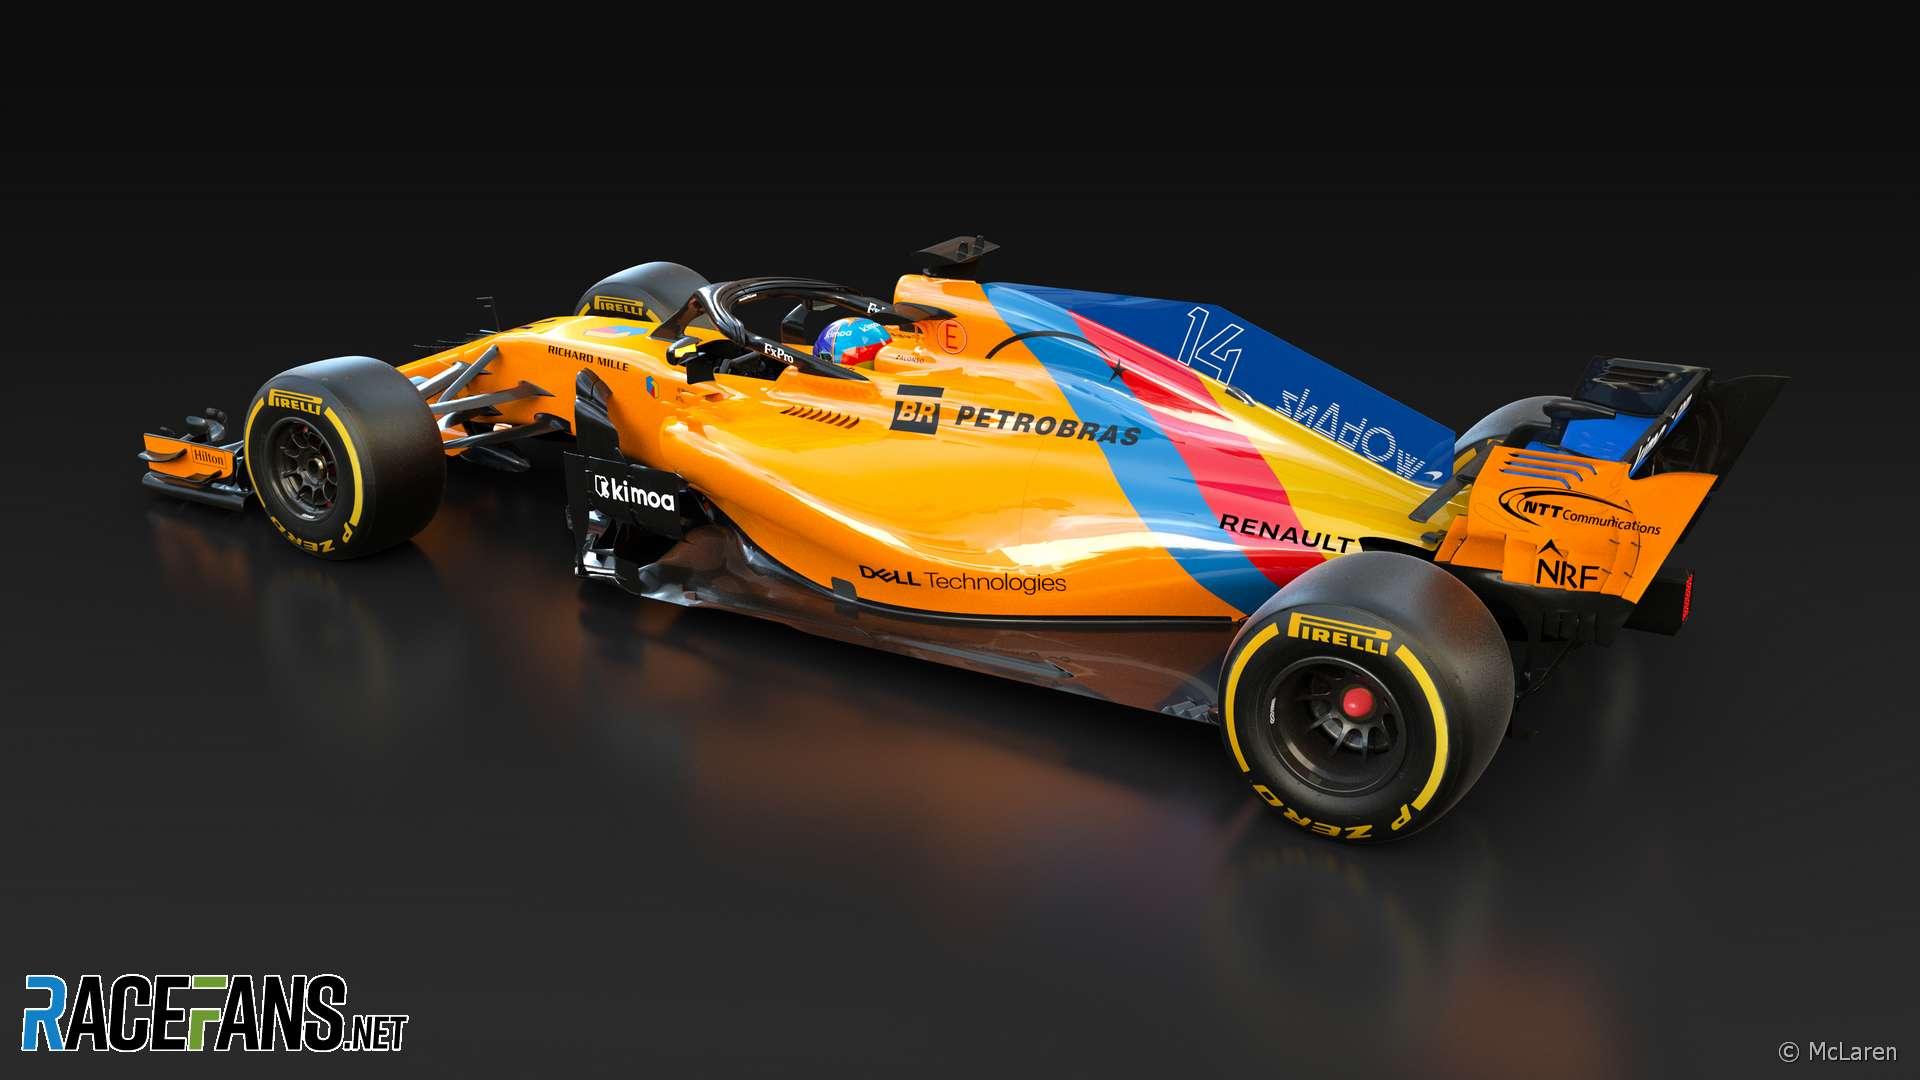 Fernando Alonso final race livery, McLaren, Abu Dhabi, 2018